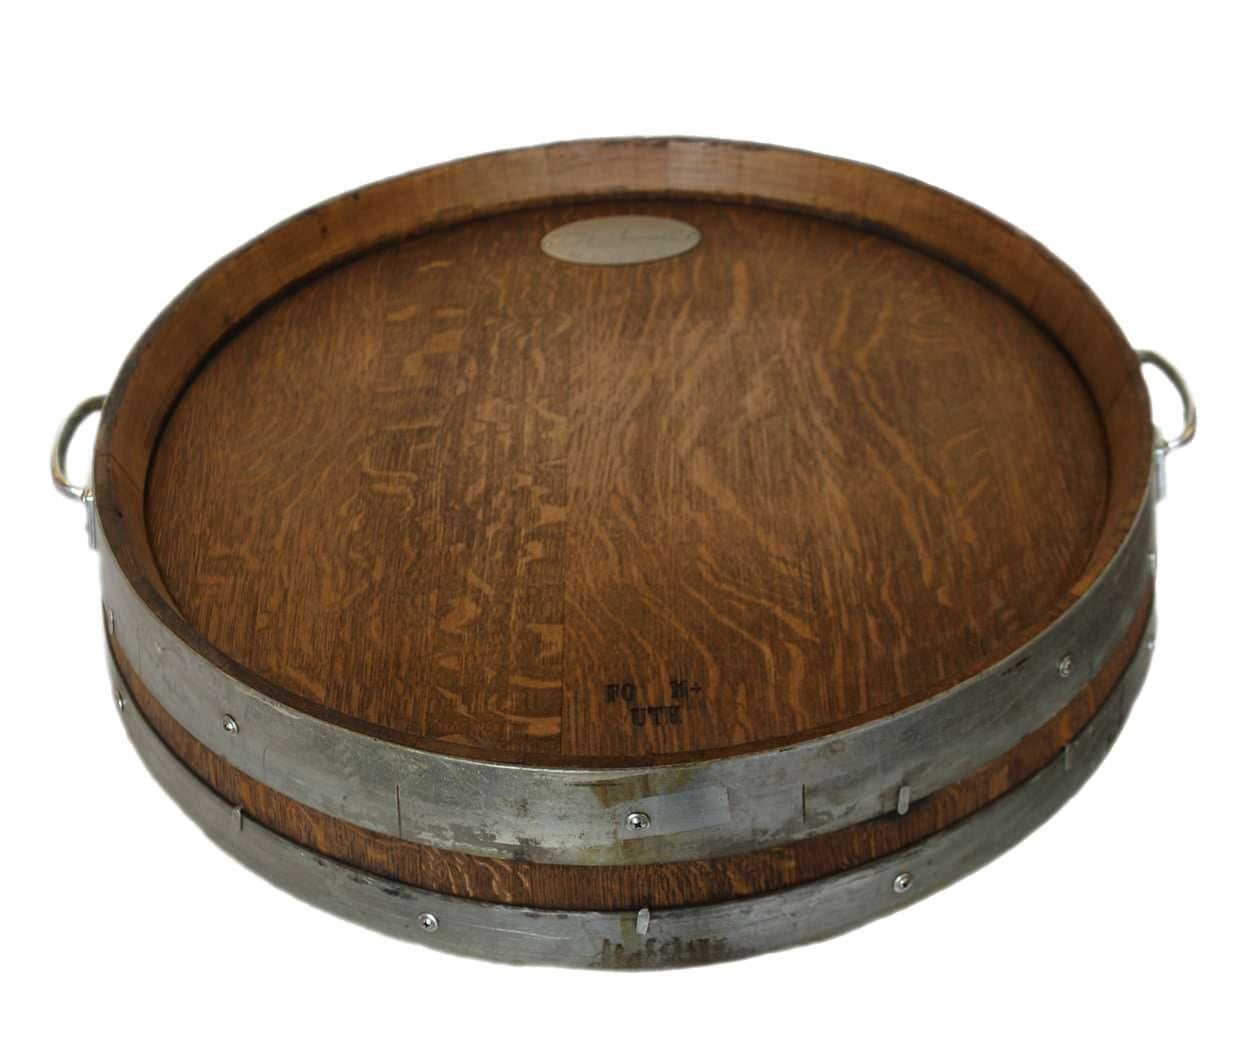 The Estate Wine Barrel Fire Pit Table